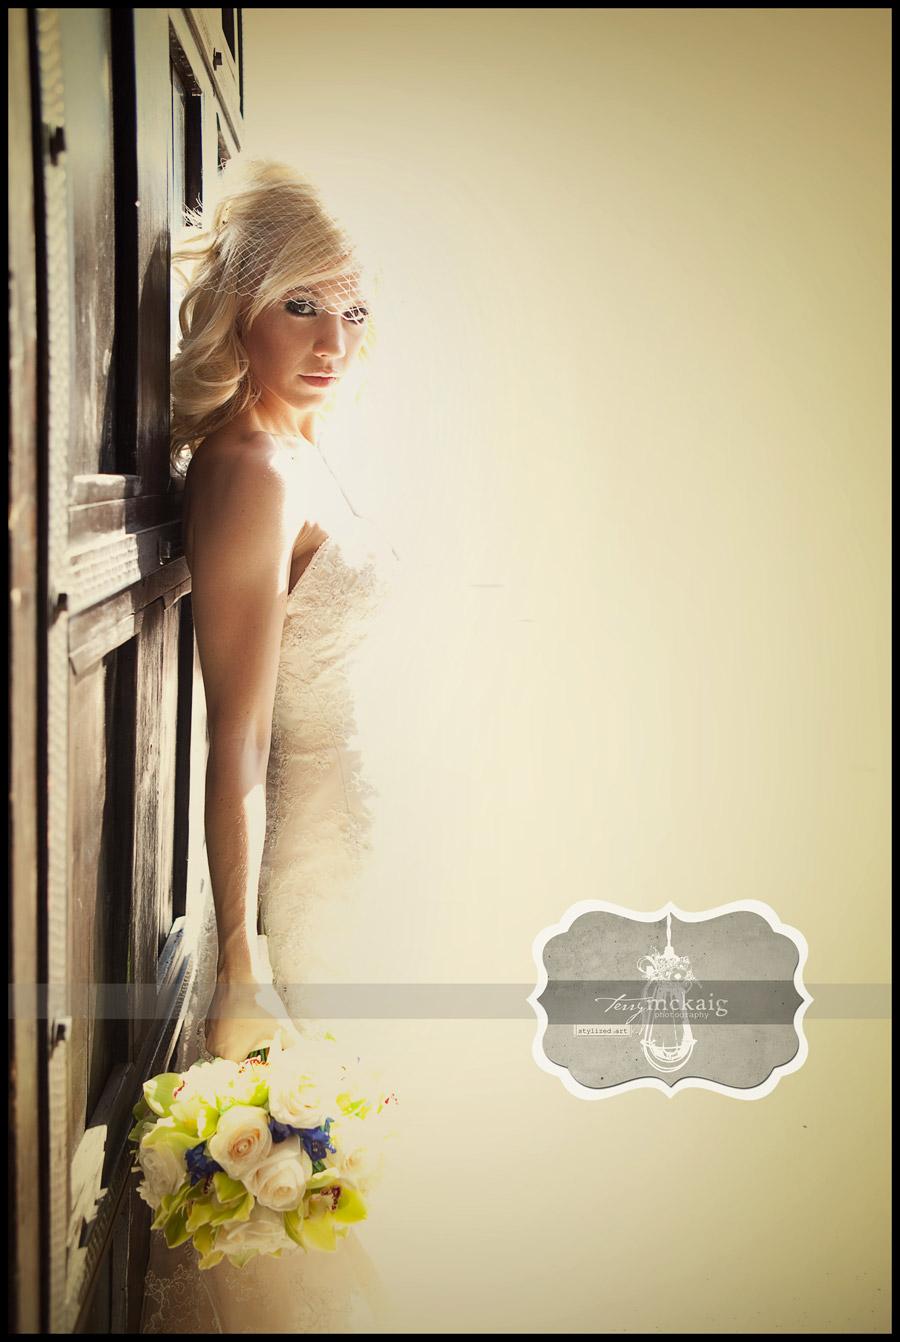 Vintage bride magazine style photography Phoenix AZ